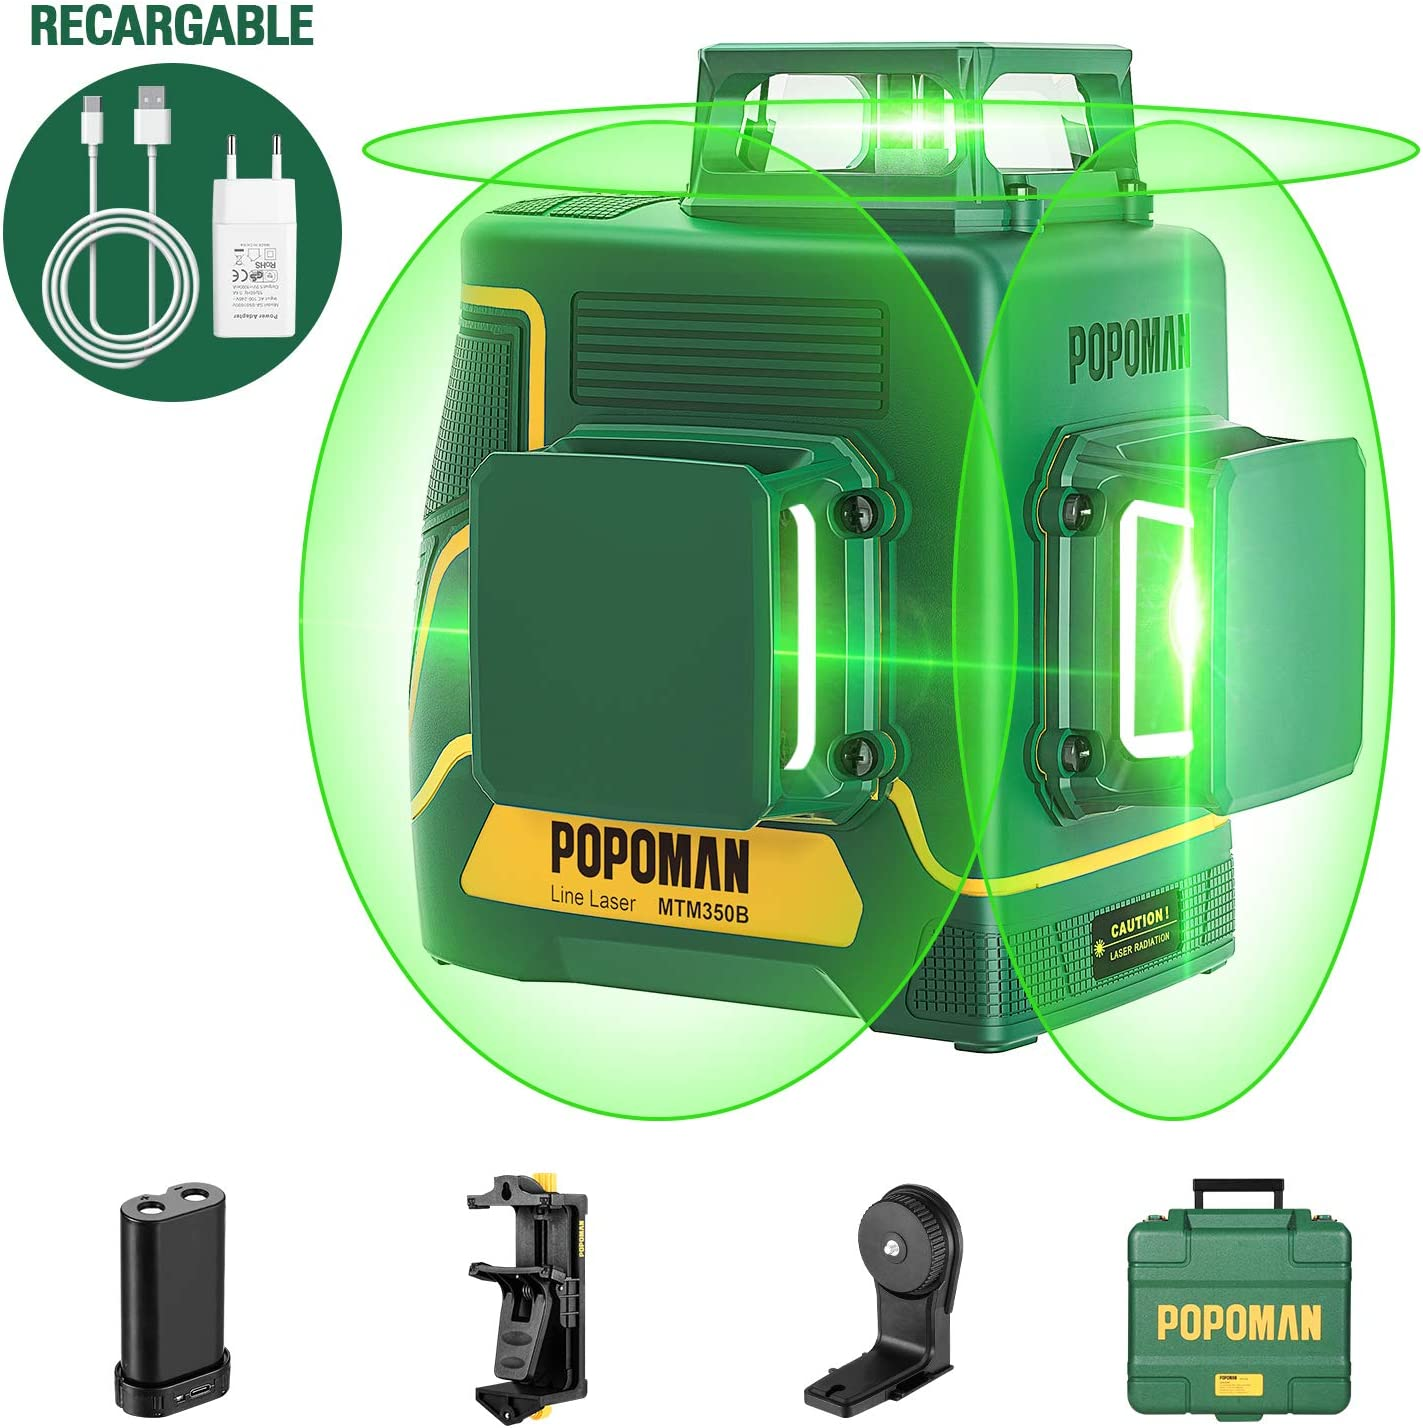 POPOMAN Nivel Láser Verde, 3x360° Profesional Línea Laser,para Diseño de Interiores,USB Carga,Autonivelación, Función de Pulso,bolsa(incl. 5200mAh batería de litio y Base Magnética)